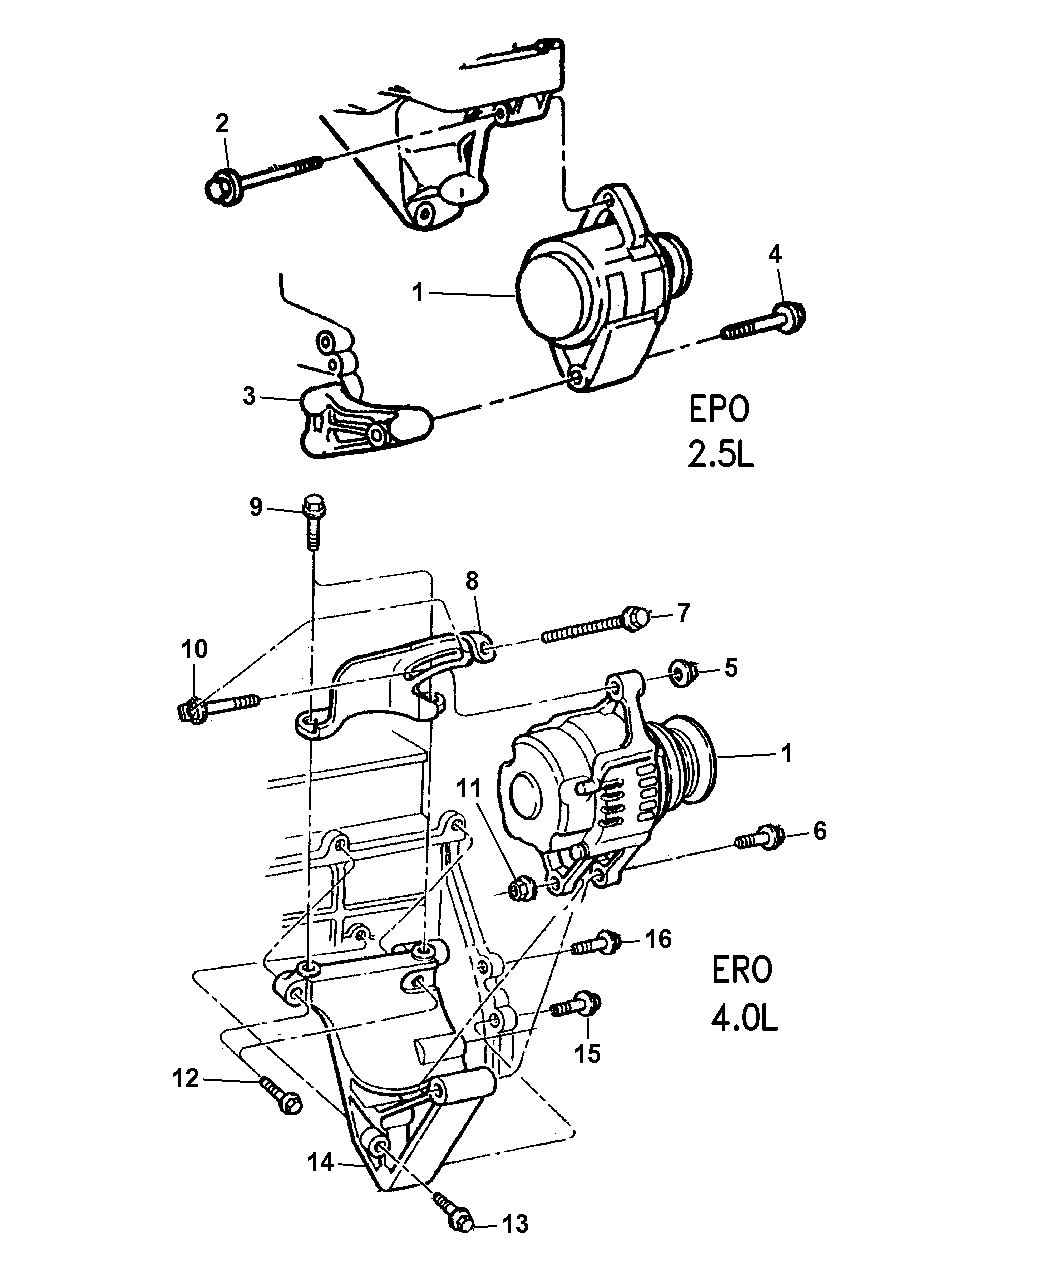 1999 Jeep Cherokee Alternator Wiring Diagram - Wiring Diagram